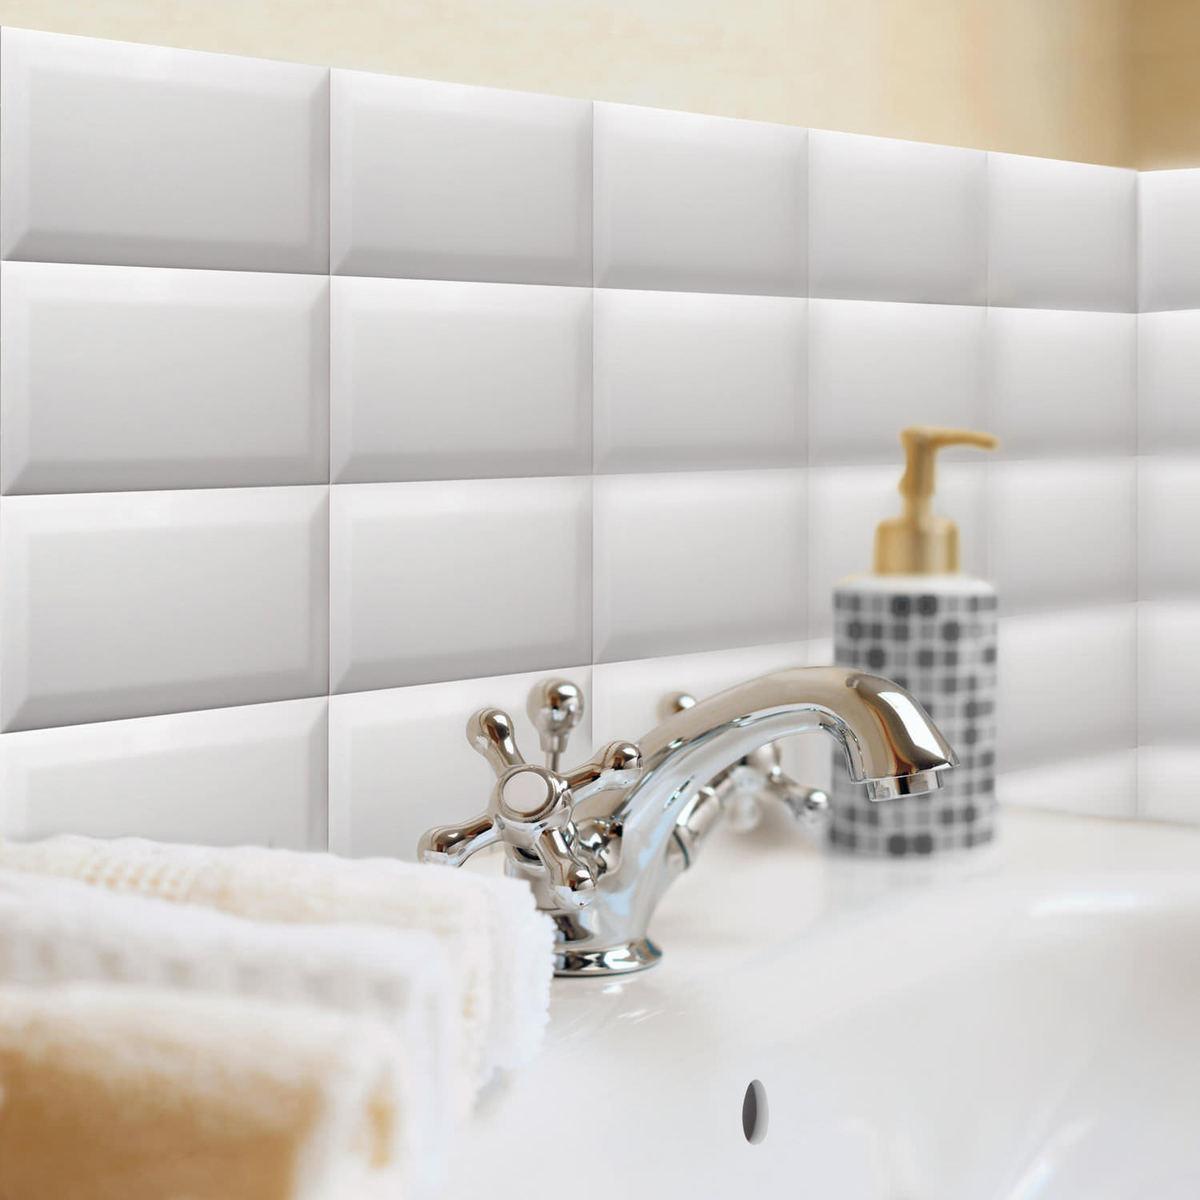 decoración-de-paredes-con-alicatados-o-azulejos